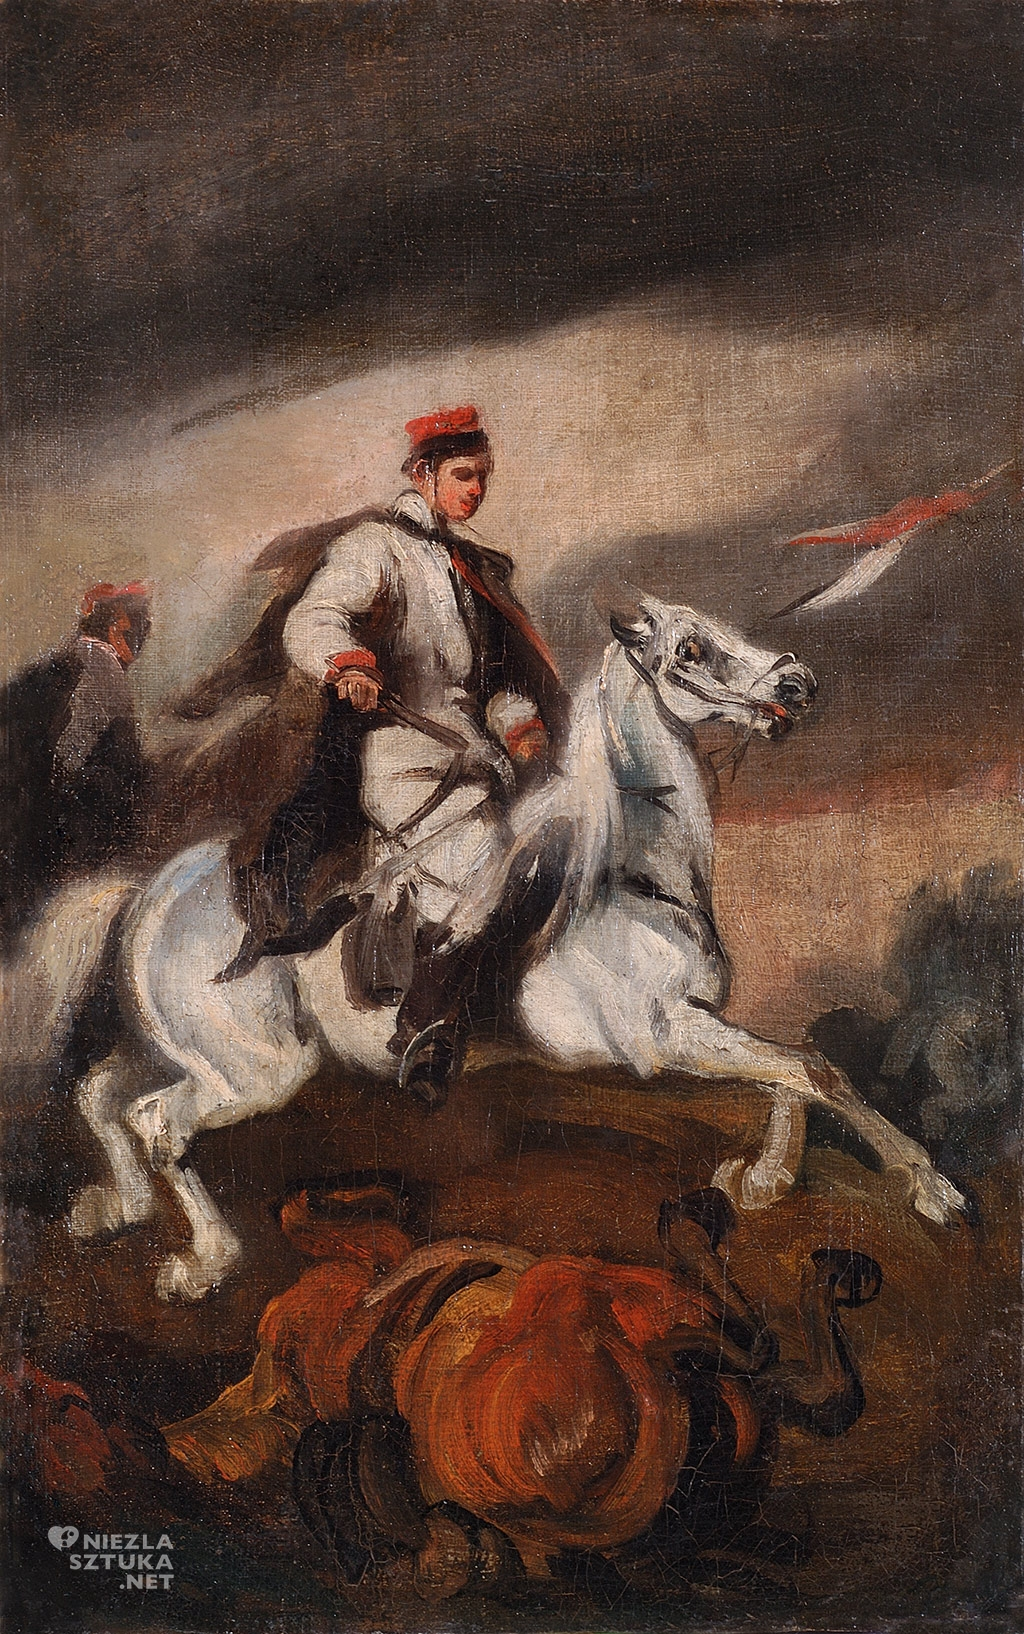 Piotr Michałowski, Krakus na koniu